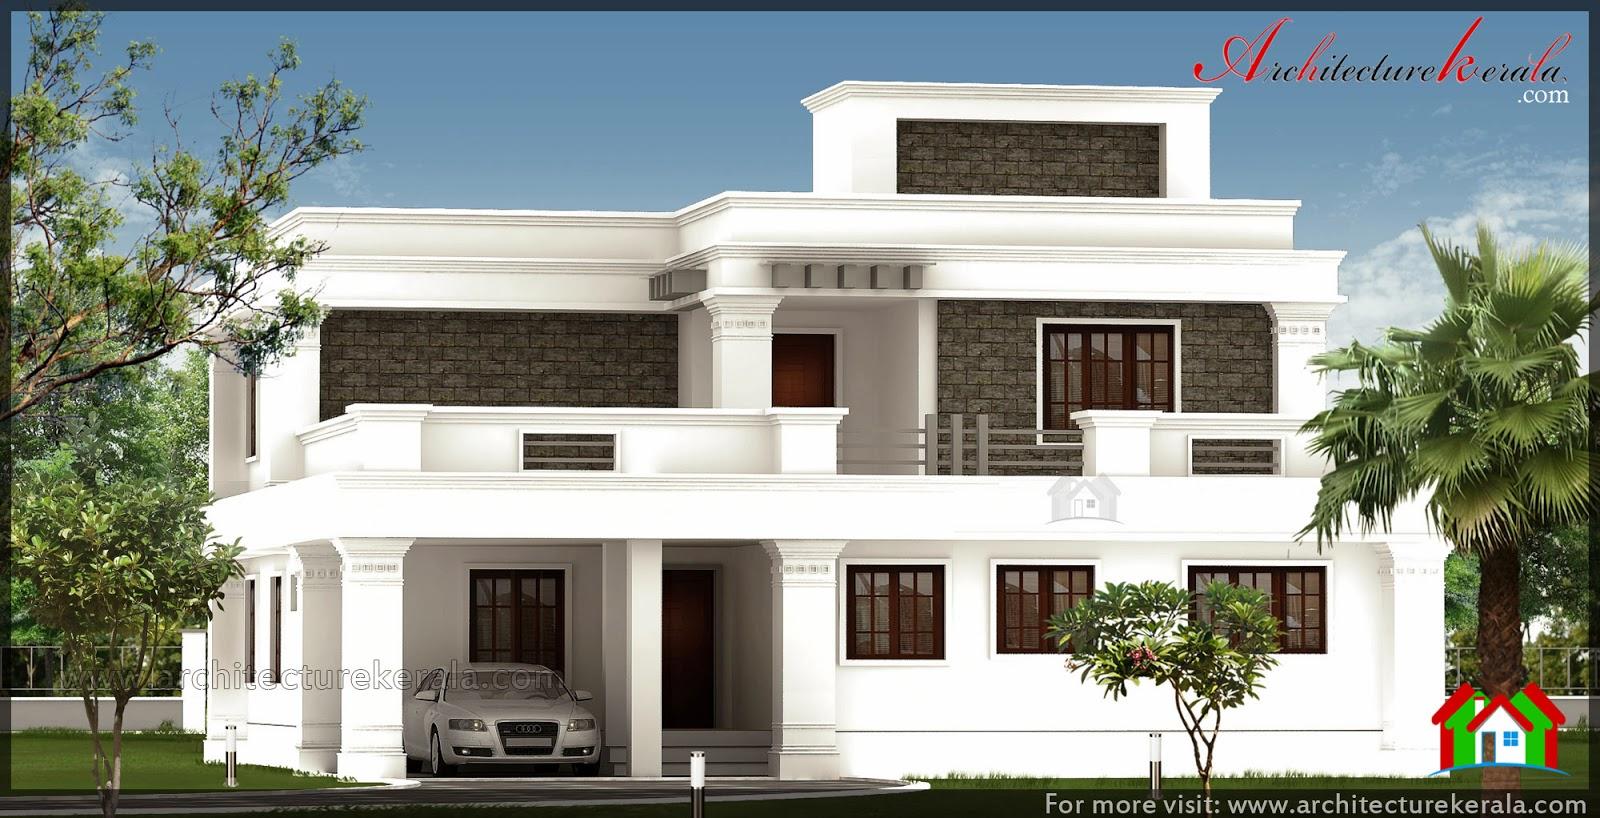 Architecture kerala january 2014 - Kerala style pillar design ...